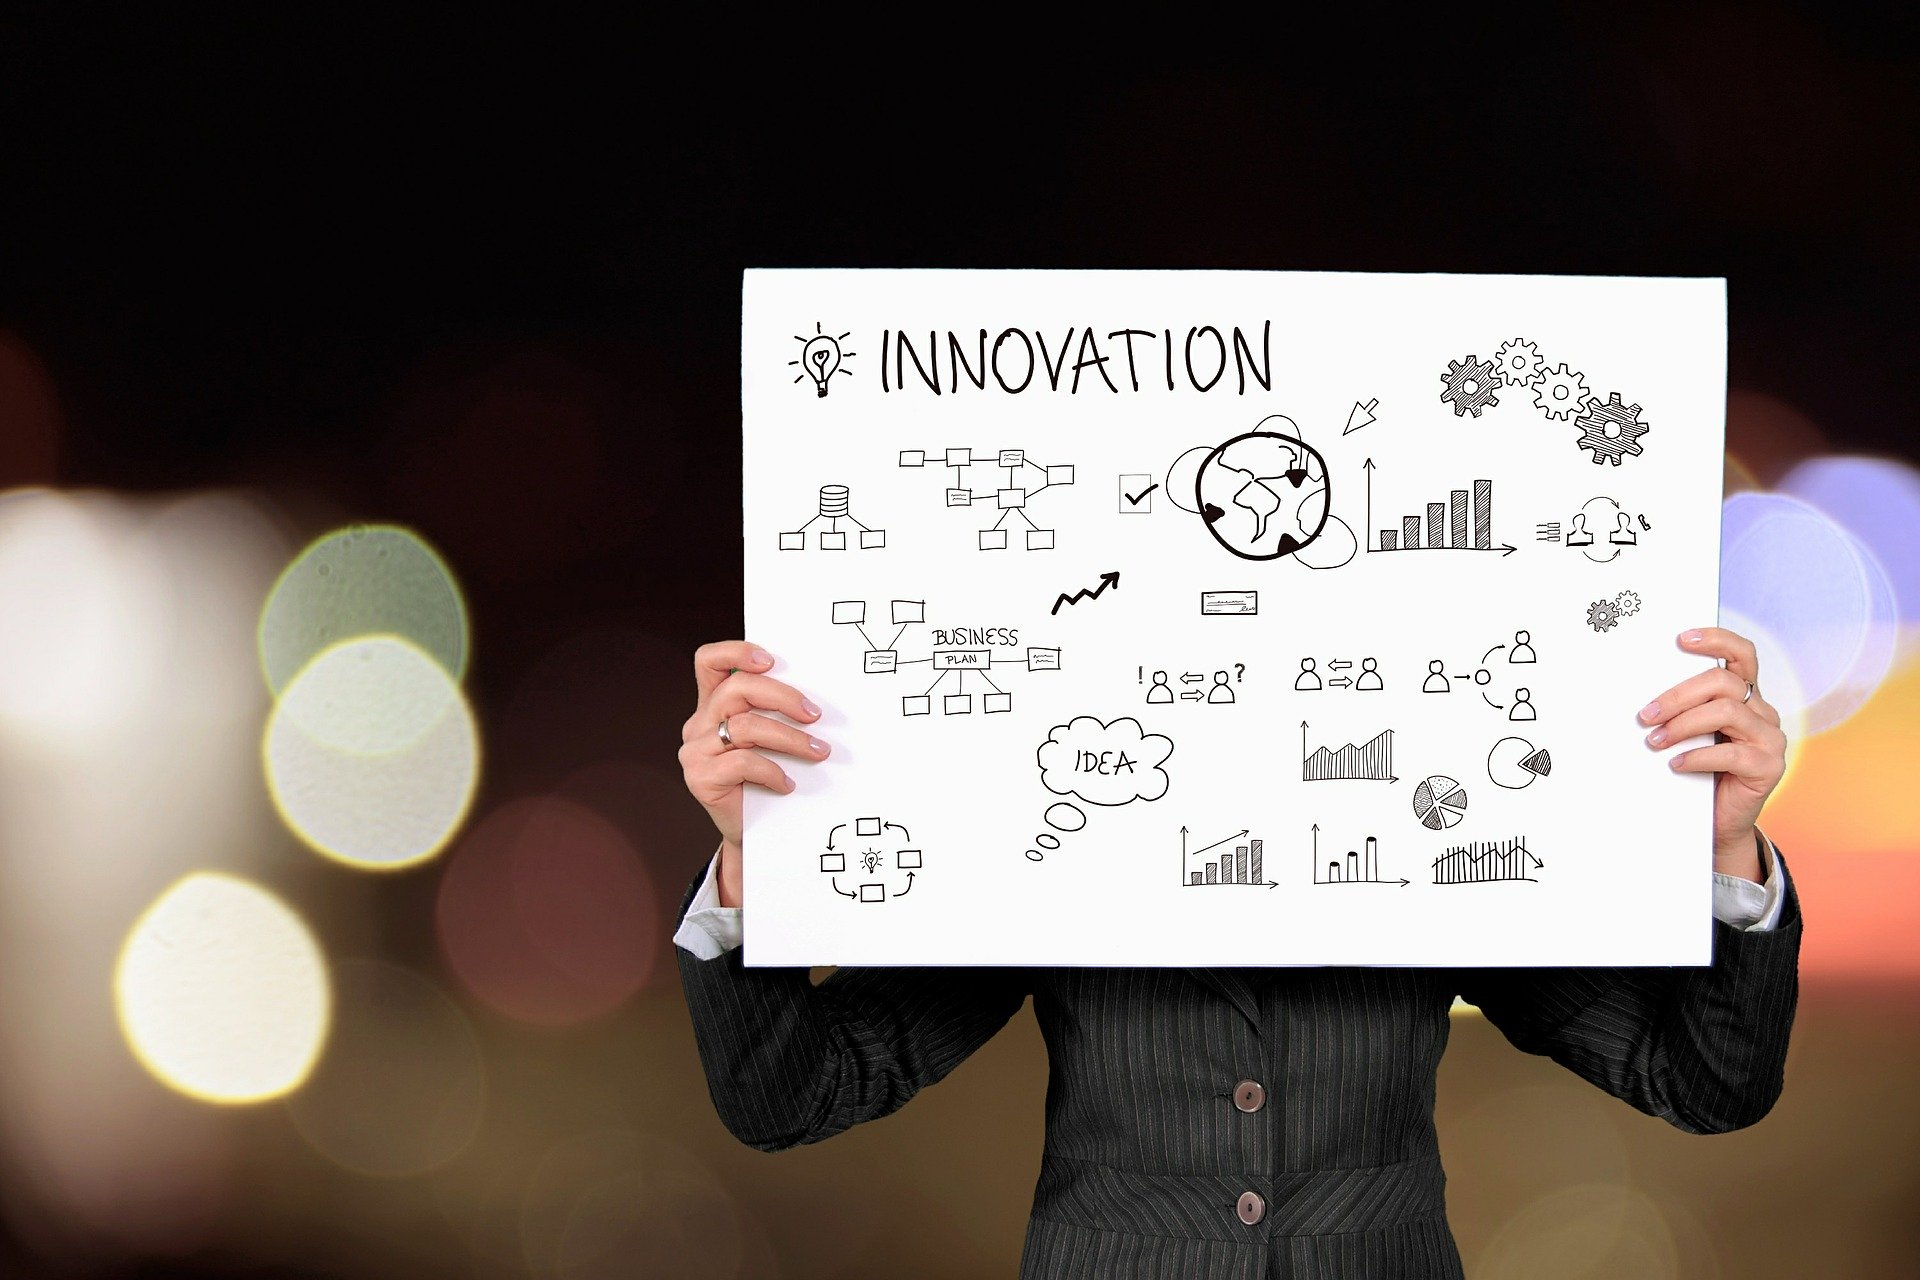 Keys to Entrepreneurship & Innovation